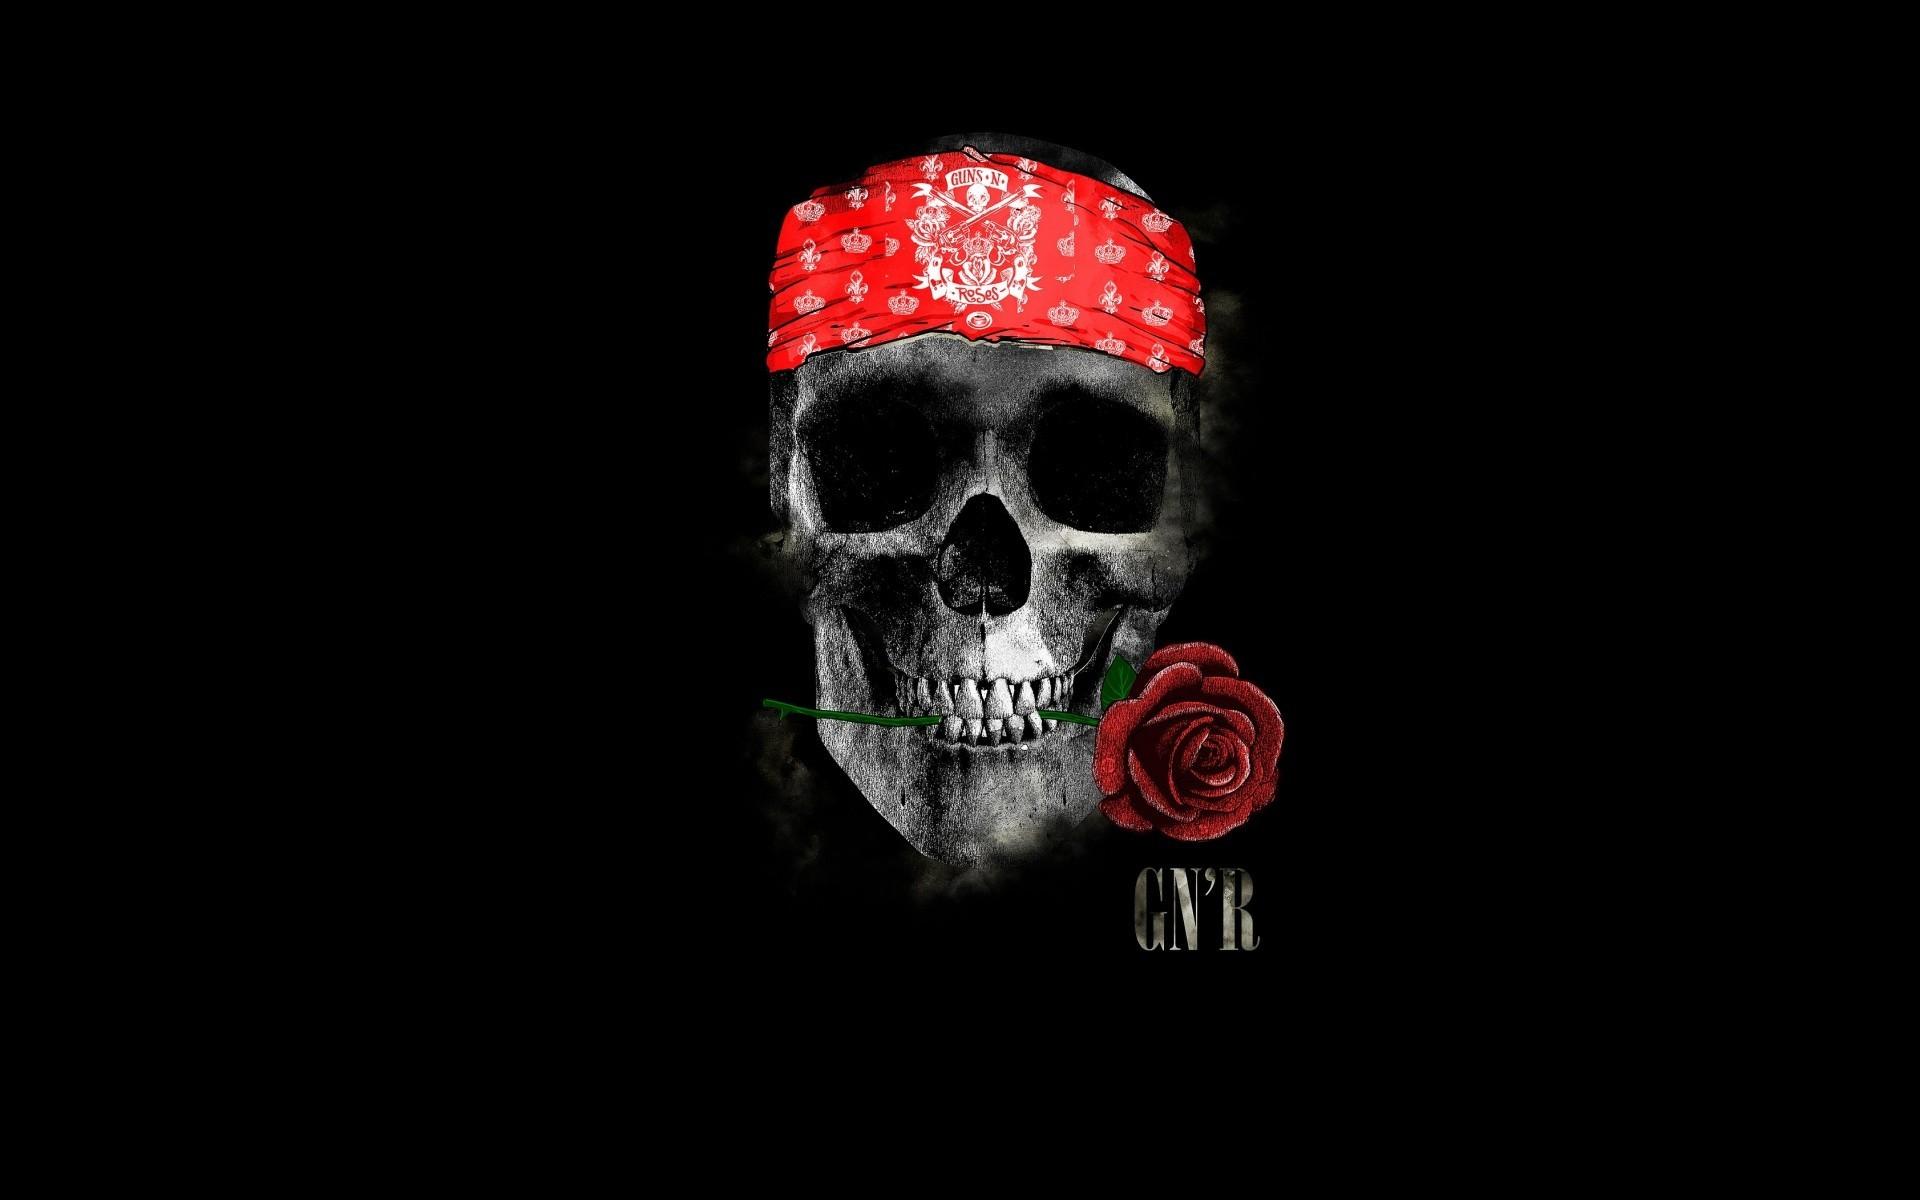 Indian Girl Wallpaper 2560x1440 Jpg Gun N Roses Hd Artist 4k Wallpapers Images Backgrounds